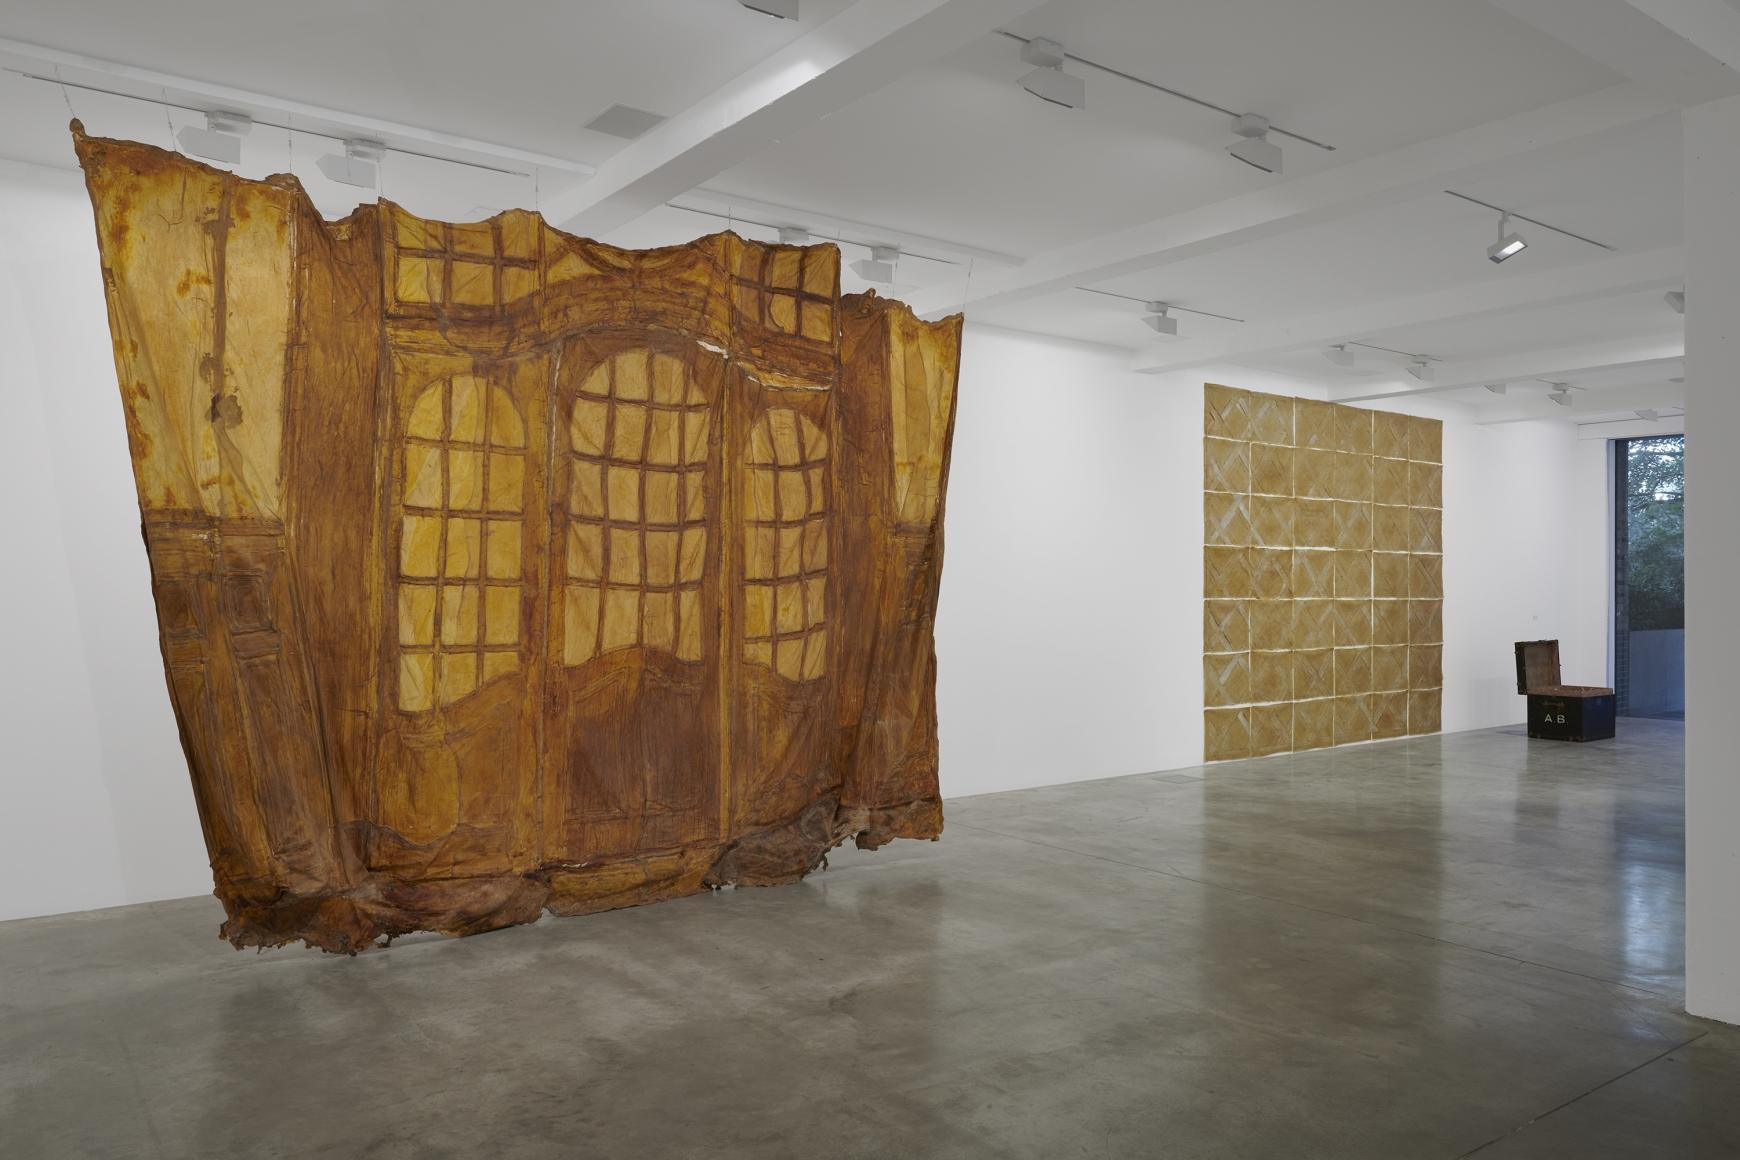 Heidi Bucher Installation view,Parasol unitfoundation for contemporary art, London, UK